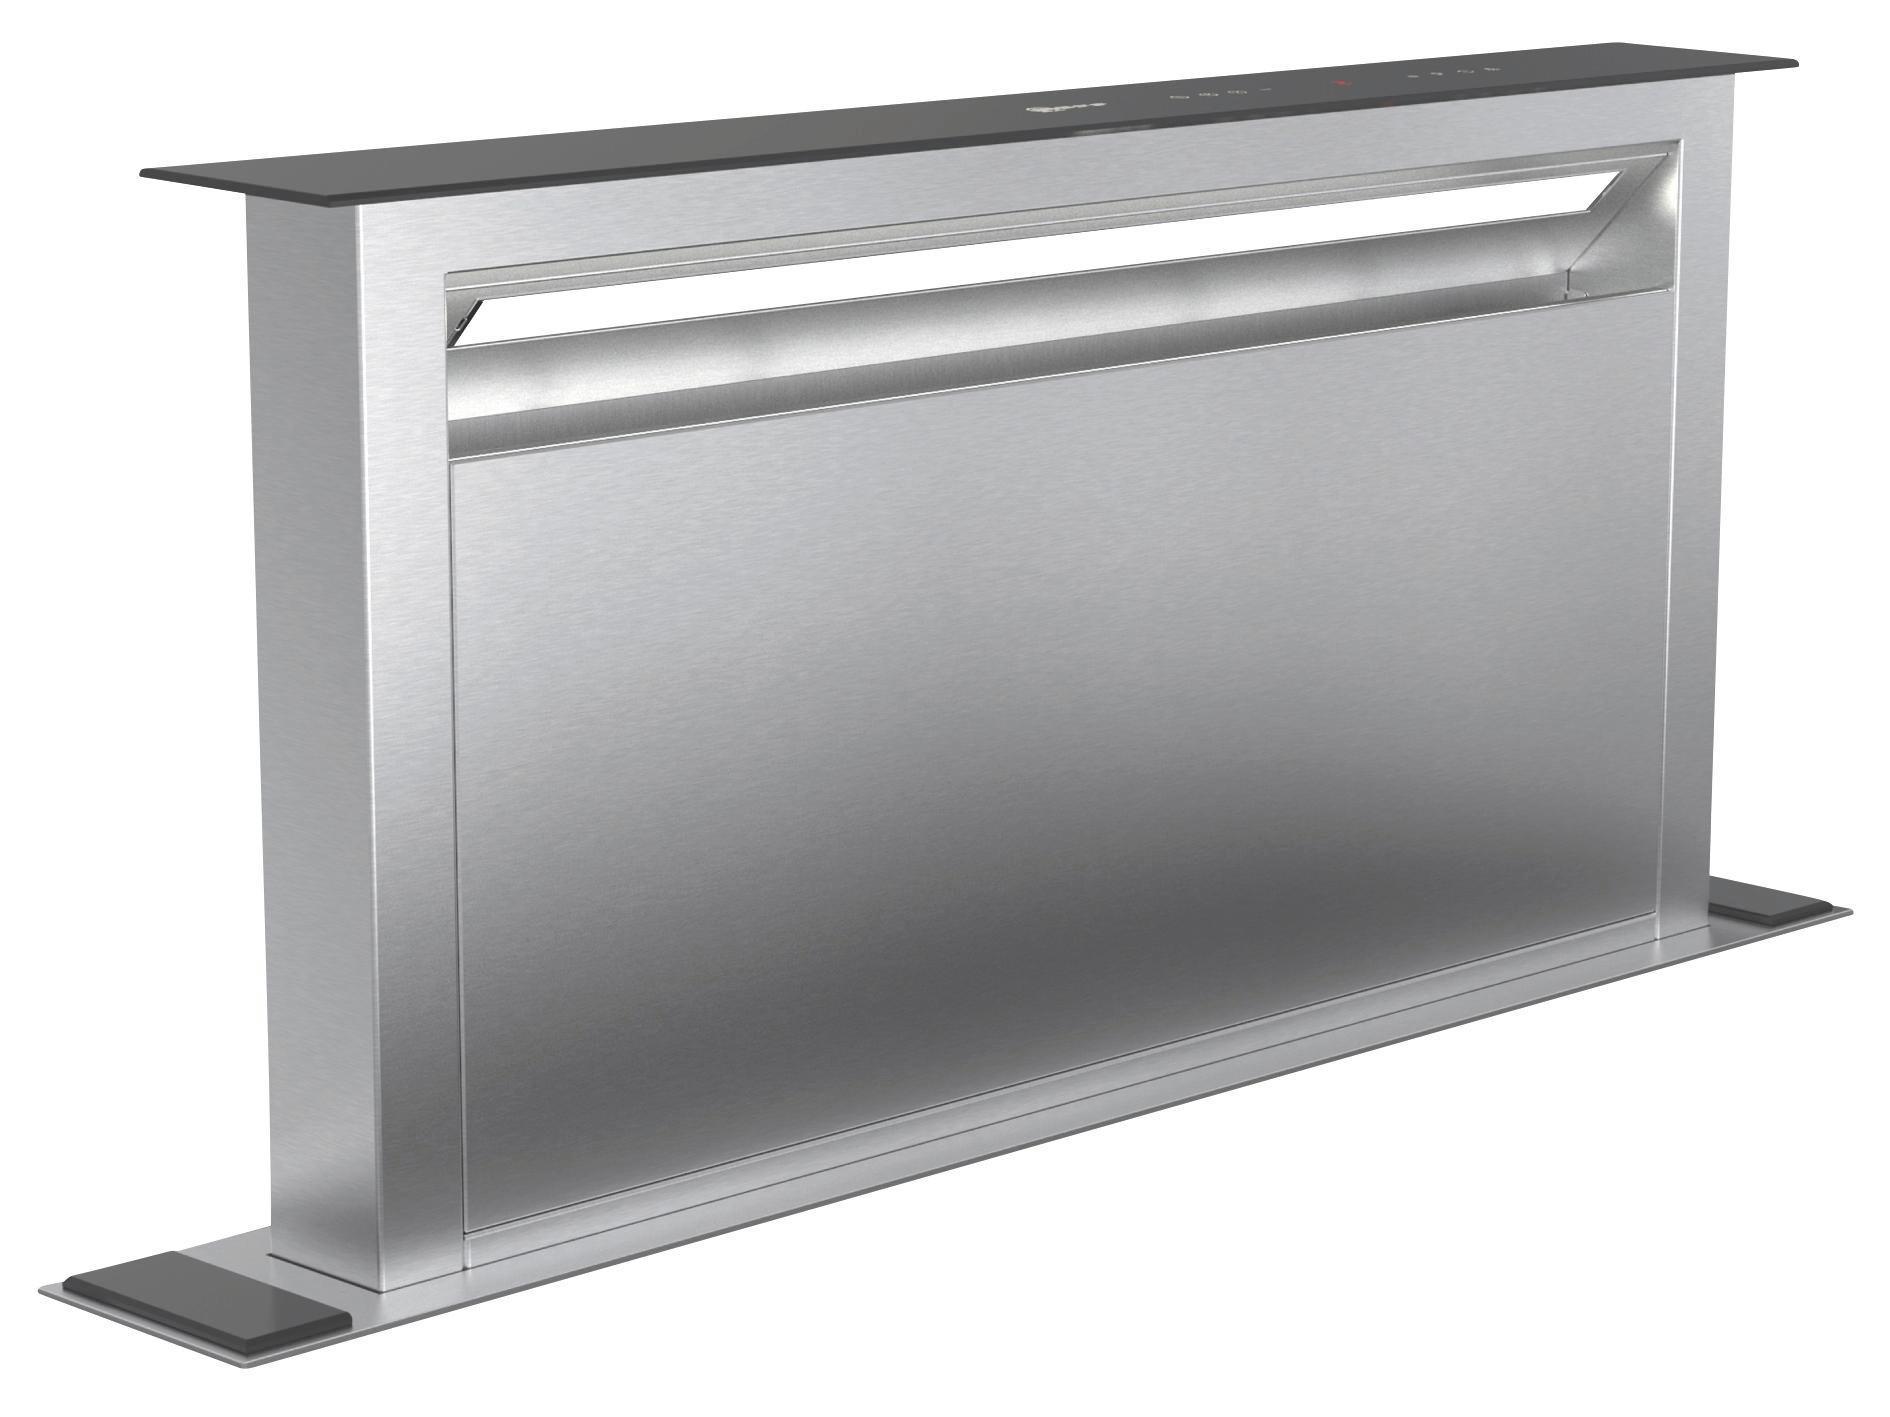 Dunstabzugshaube Neff Airdeluxe300, EEZ C - ROMANTIK / LANDHAUS, Metall (88/65,2-105,2/35,2cm) - NEFF